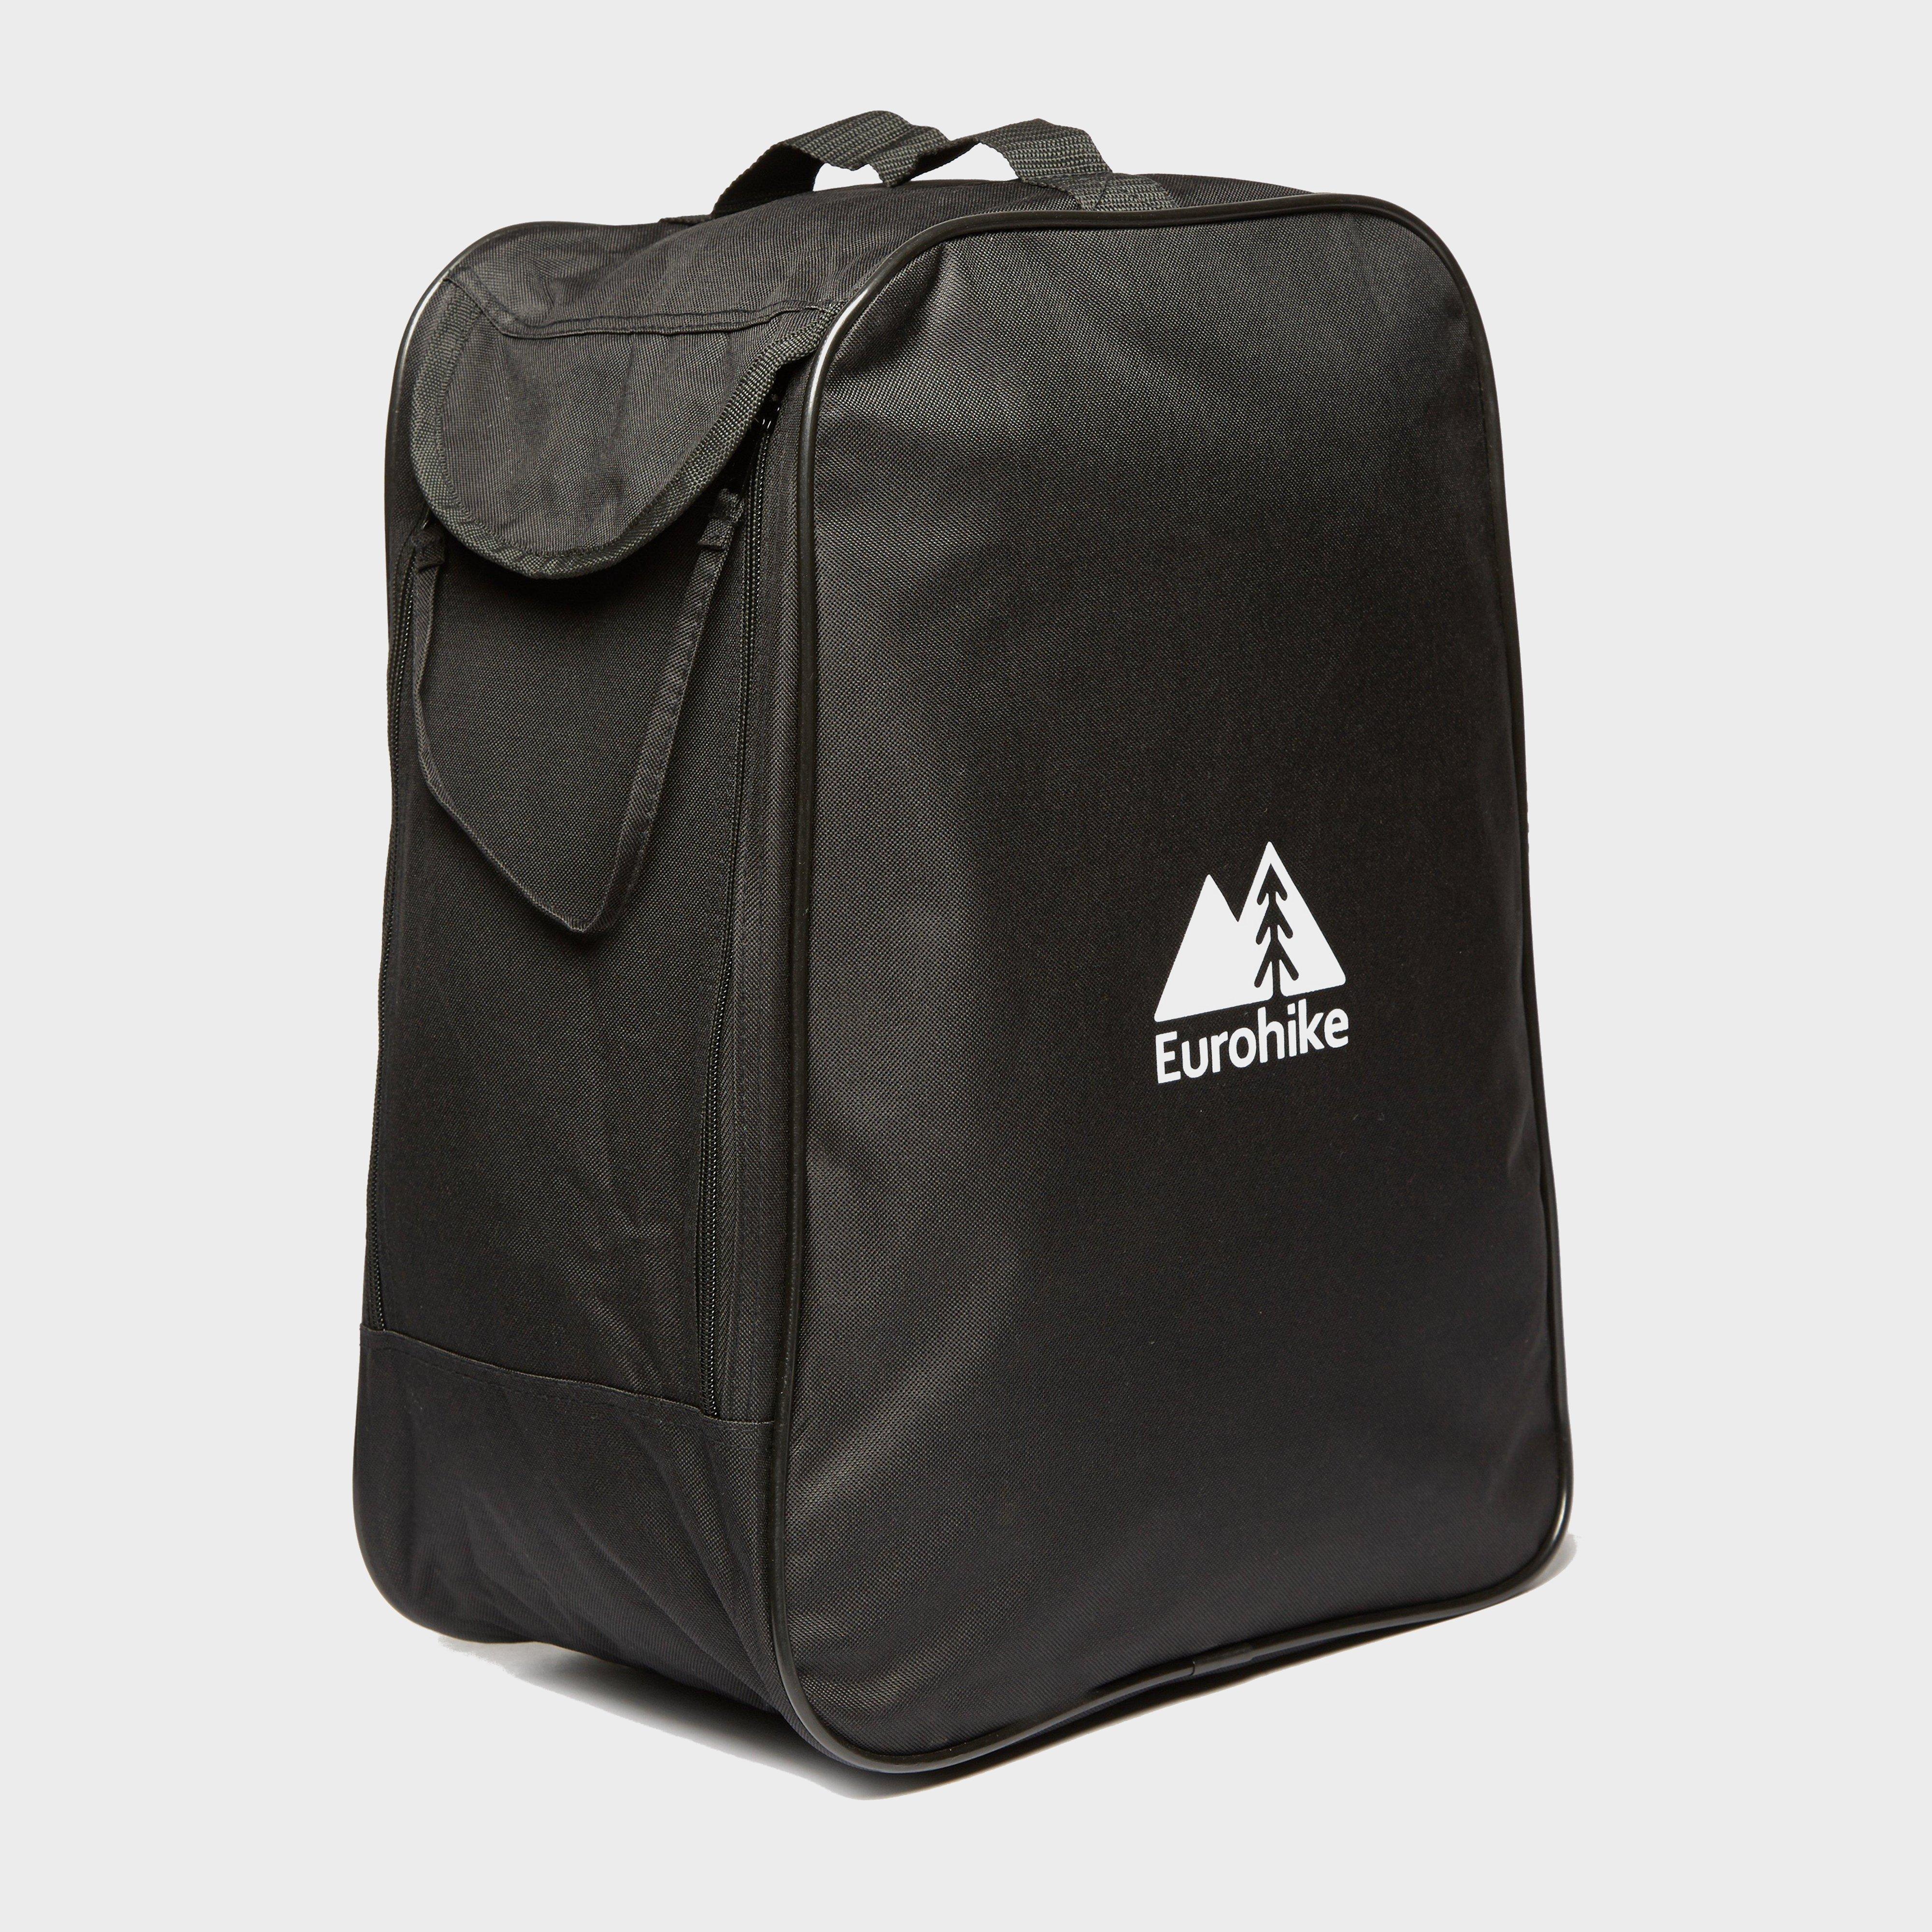 Eurohike Wellington Boot Bag - Black, Black